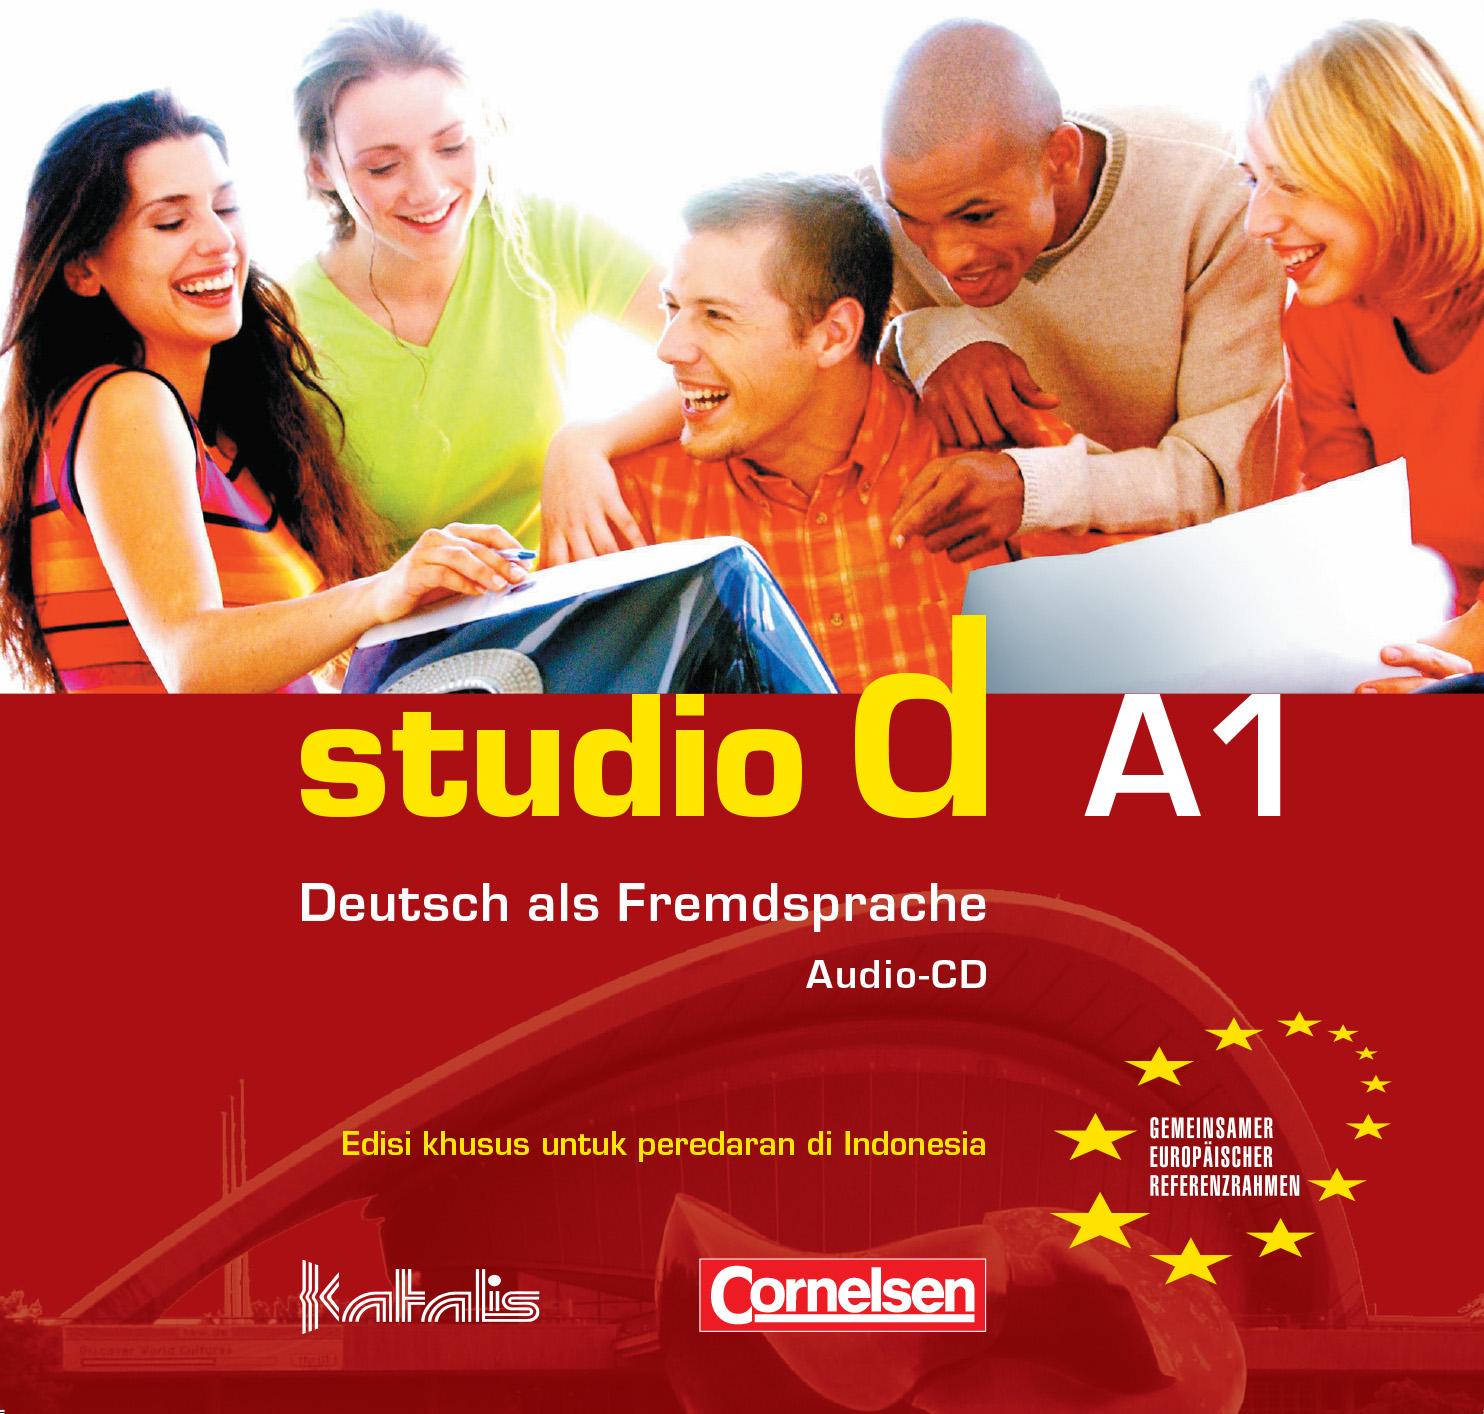 studio d A1, Audio-CD für den Kursraum